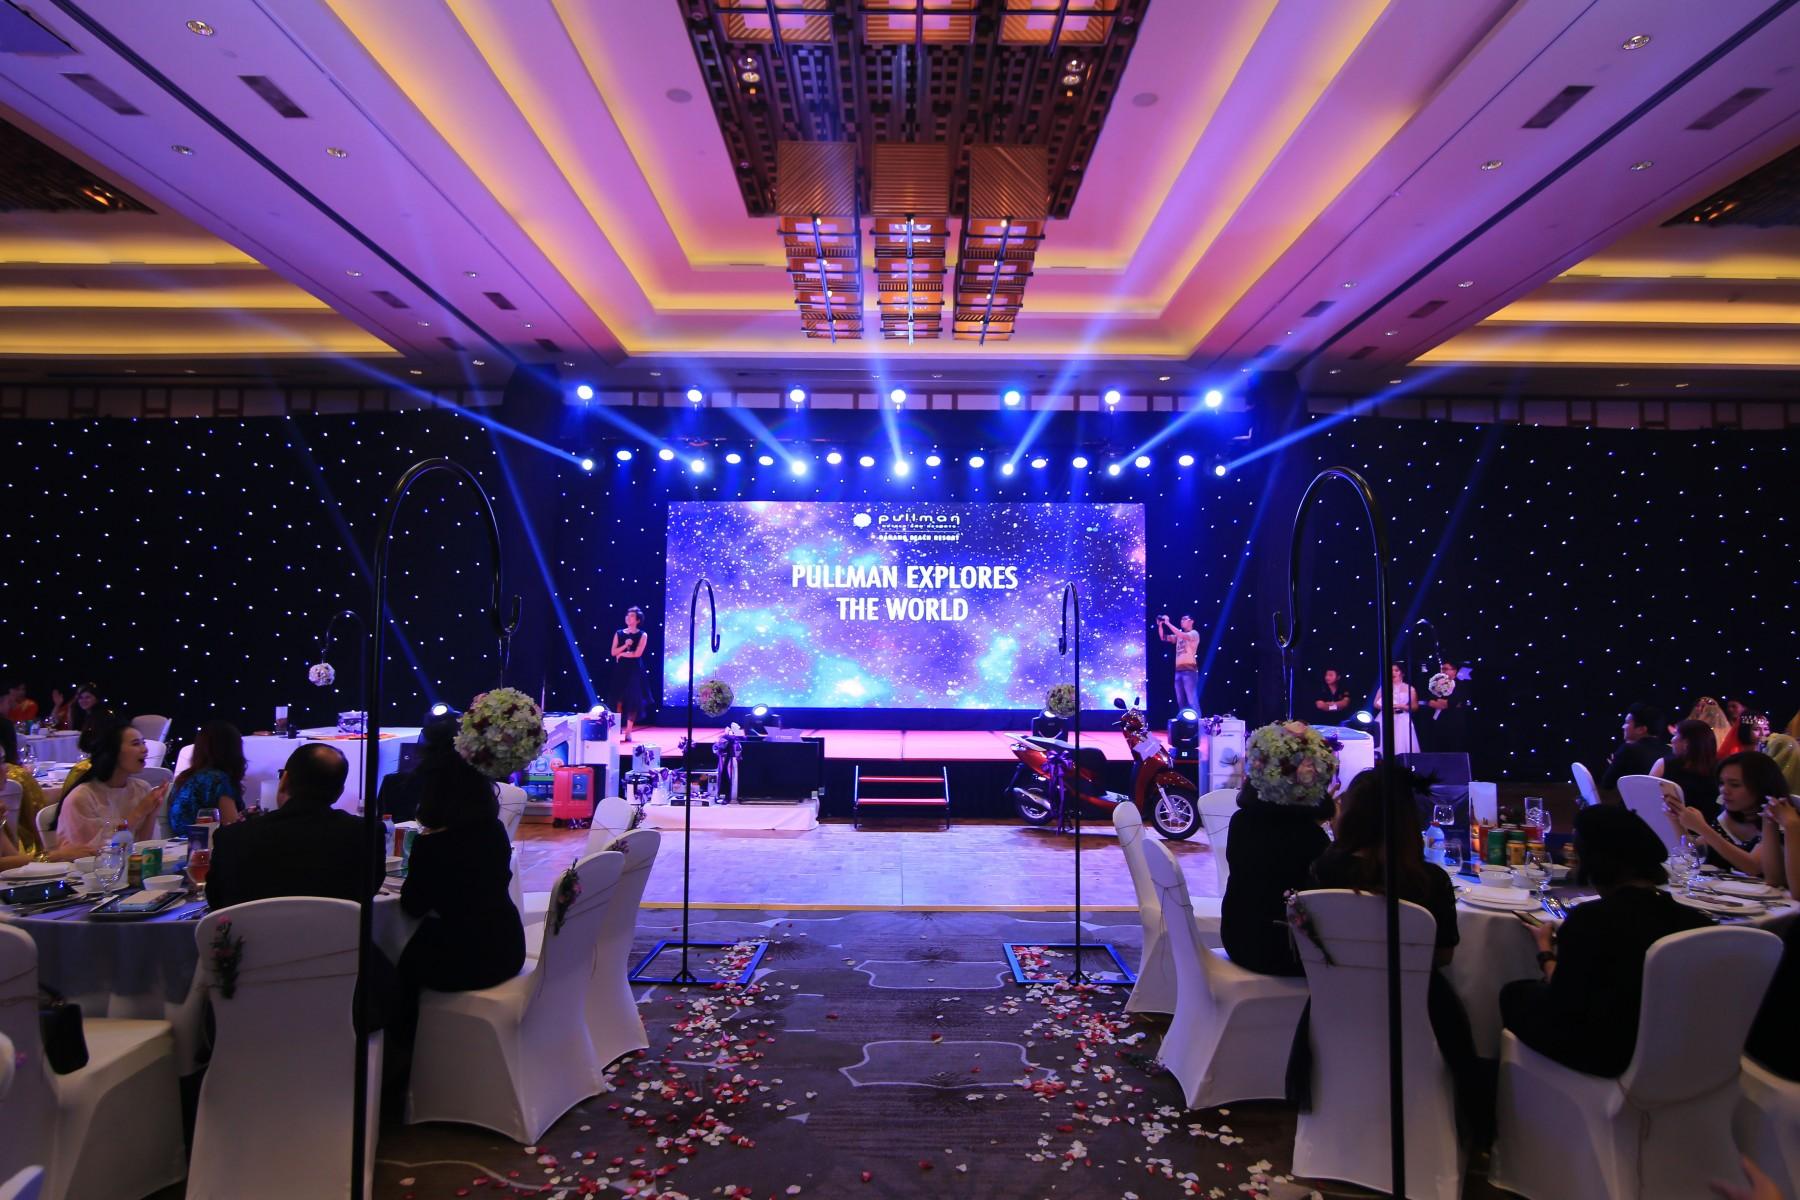 Backdrop-explore-all-around-the-world-theme-party-set-up-year-end-celebration-pullman-danang-beach-resort-indoor-venue-lotus-ballroom-5